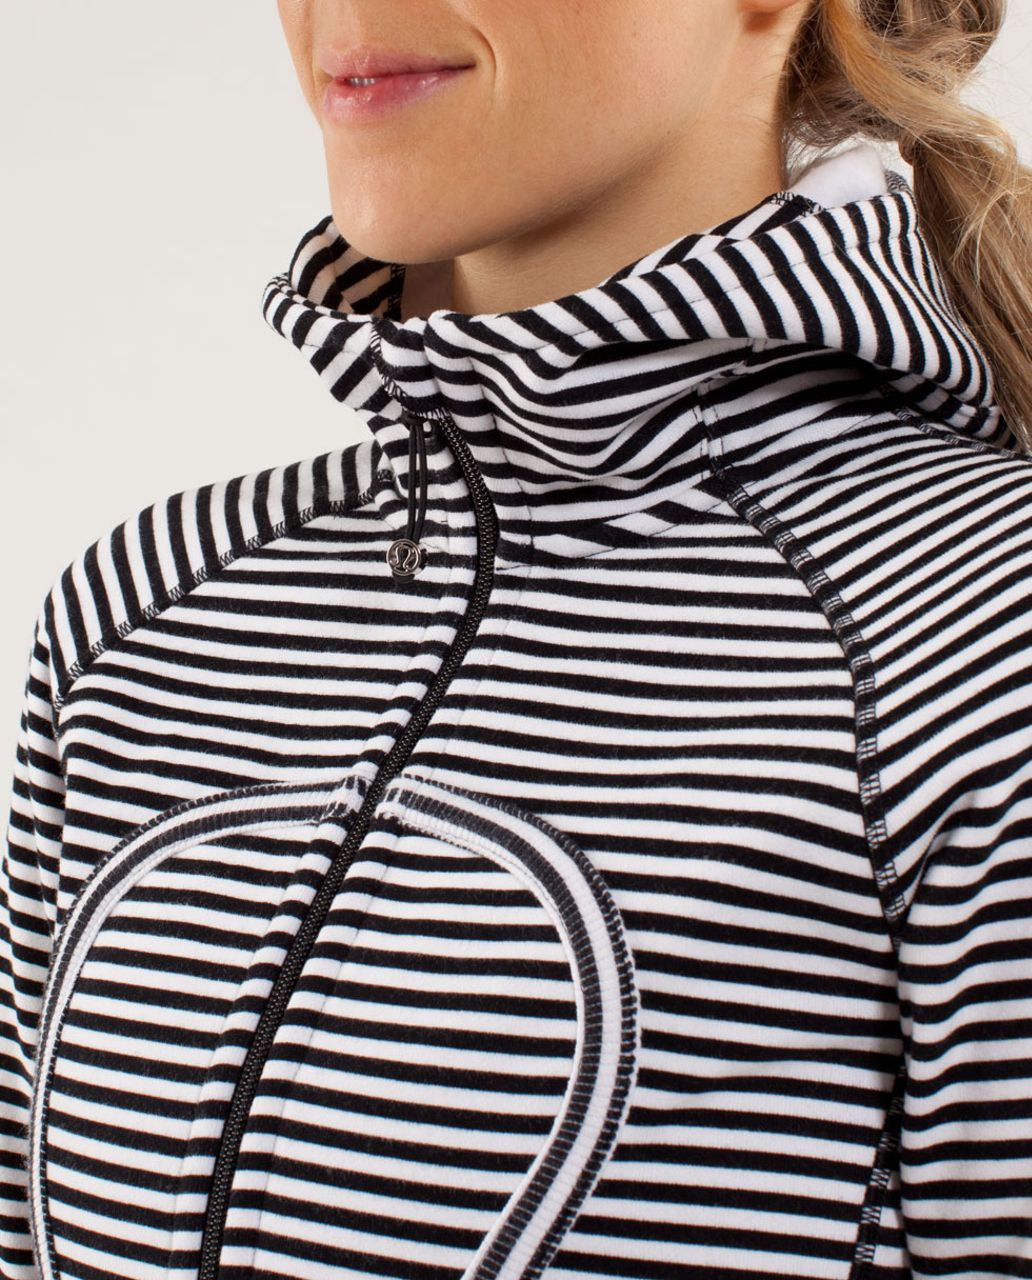 Lululemon Scuba Hoodie *Stretch - Classic Stripe Printed White Black